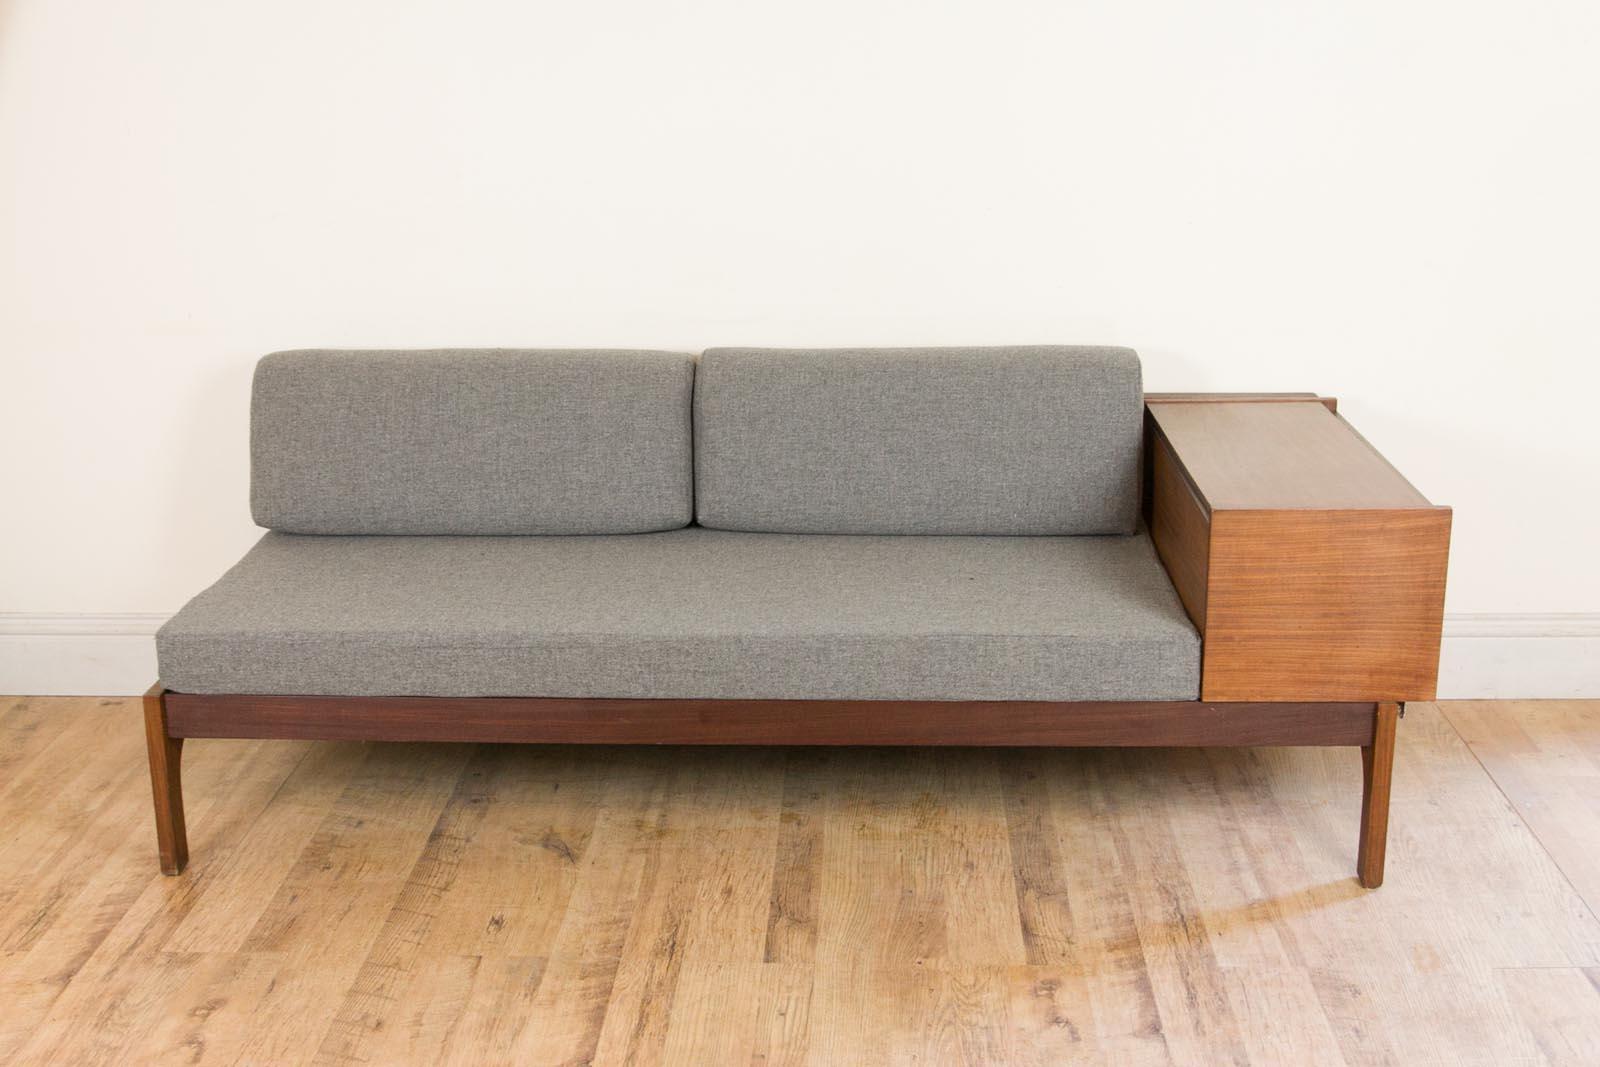 danish style sofa bed uk best places to buy sofas vintage retro daybed eames era ebay